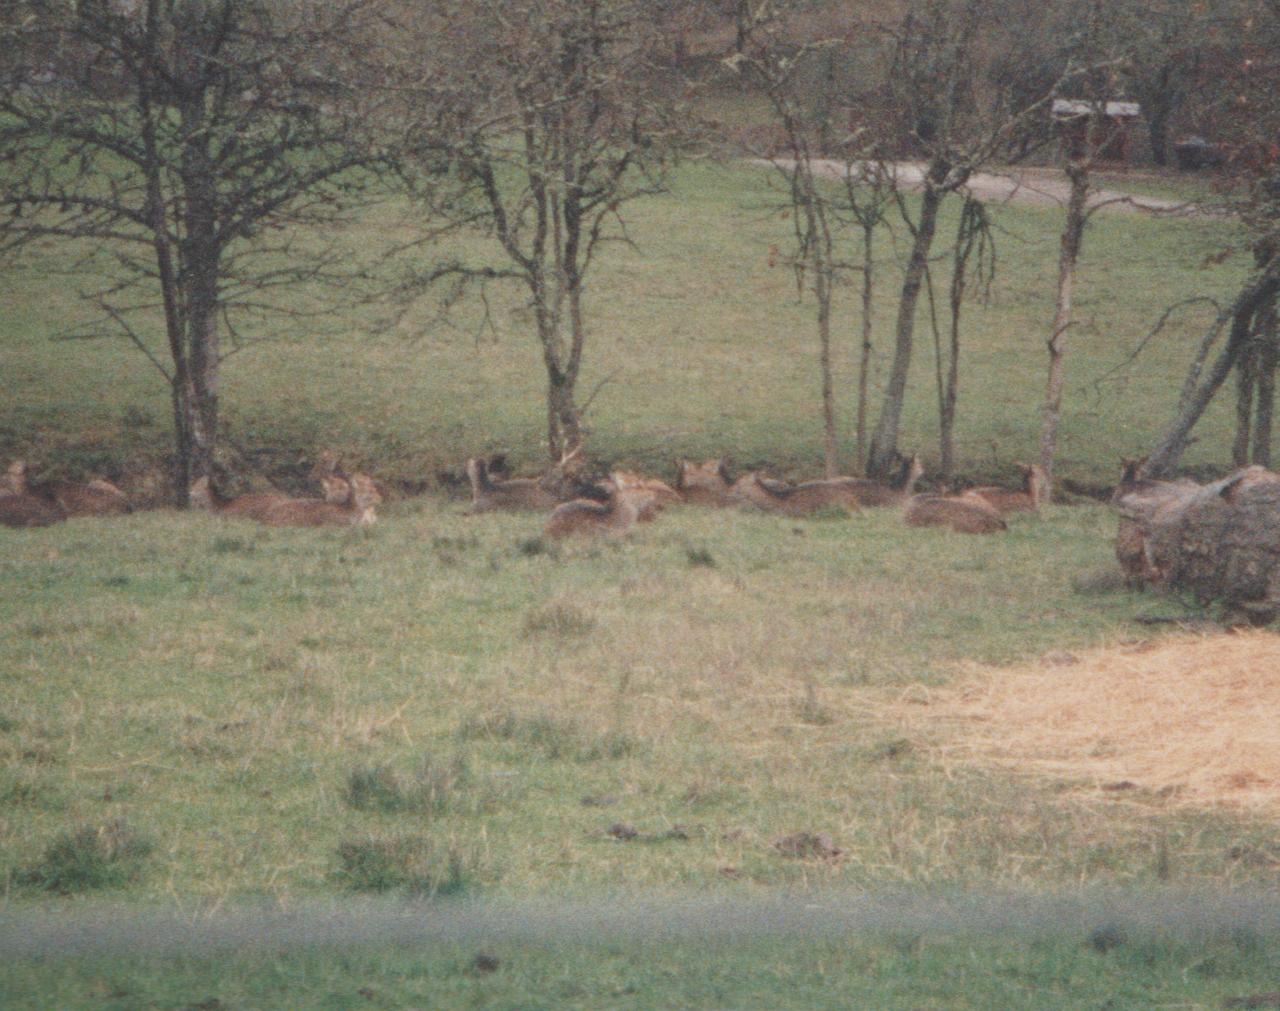 1992-12-26 - Saturday - Wildlife Safari Trip, Marilyn, Crystal-09.png